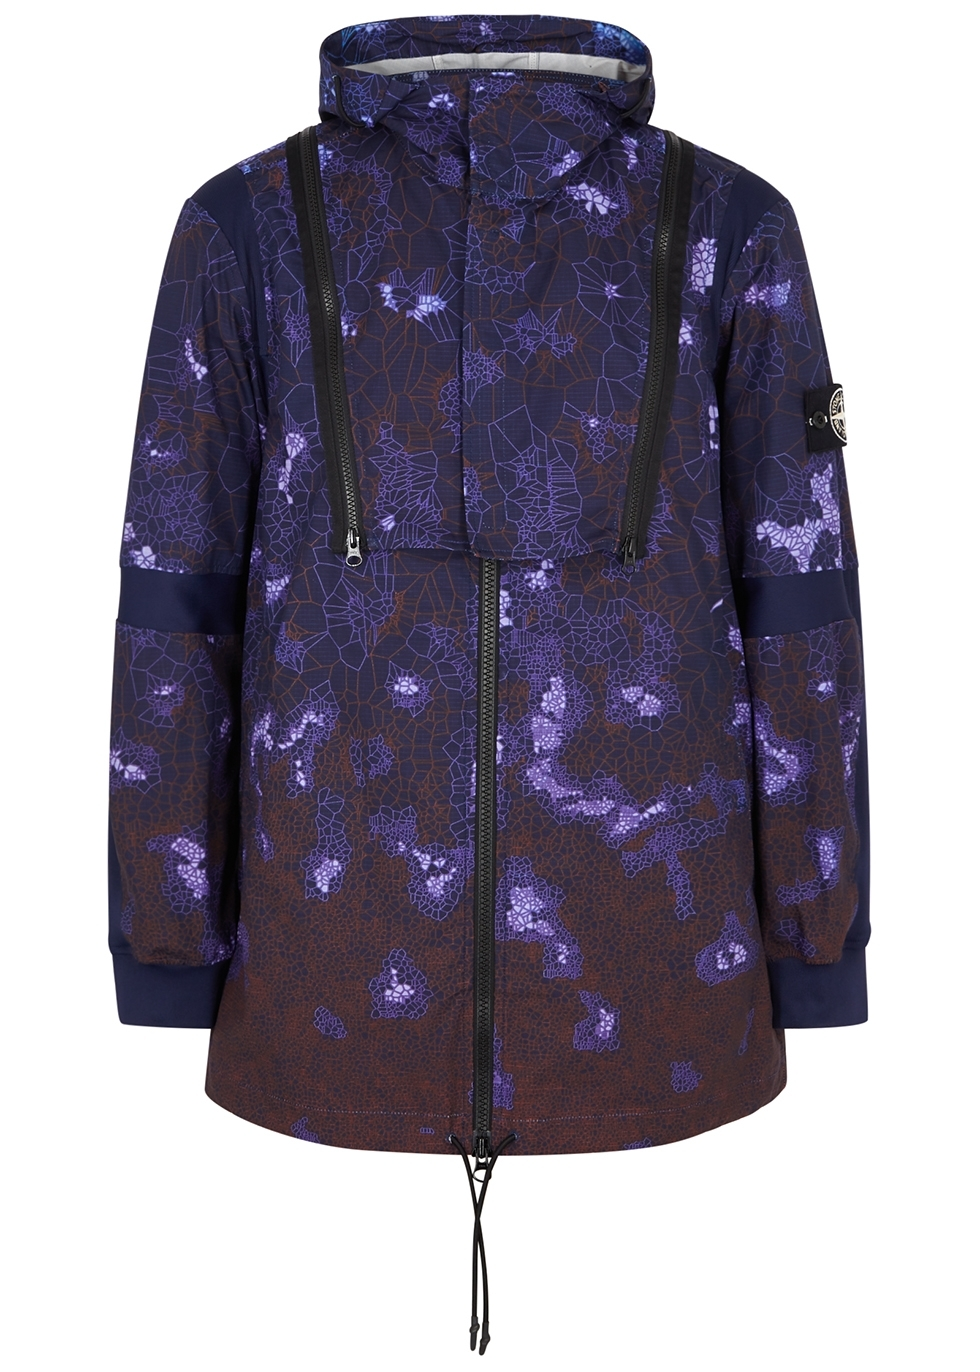 8d1eb9b0586d Men s Designer Jackets - Winter Jackets for Men - Harvey Nichols